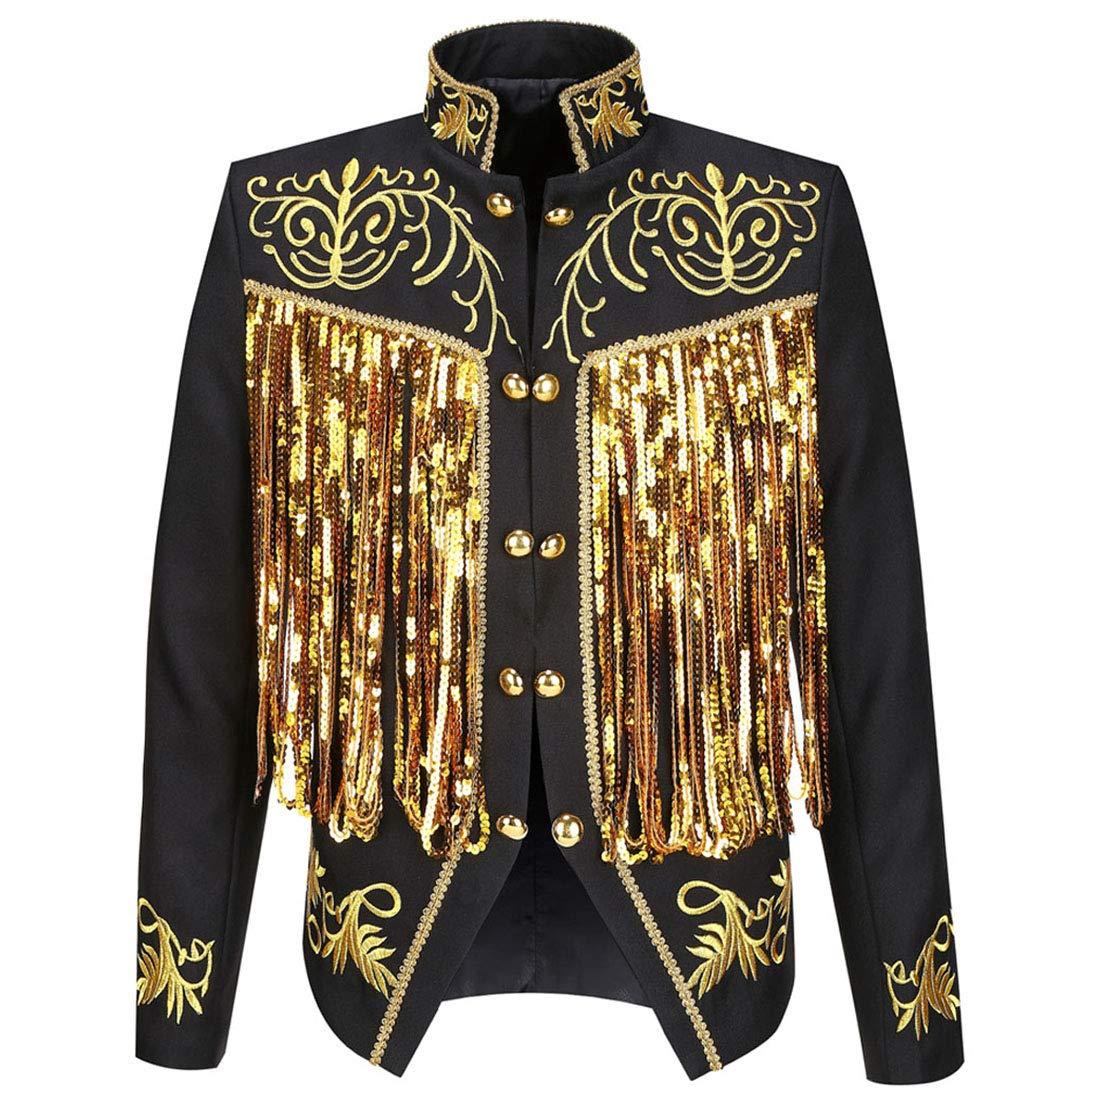 PYJTRL Mens Fashion Gold Embroidery Tassels Sequins Suit Jacket (Black, Tag L/US 36R) by PYJTRL